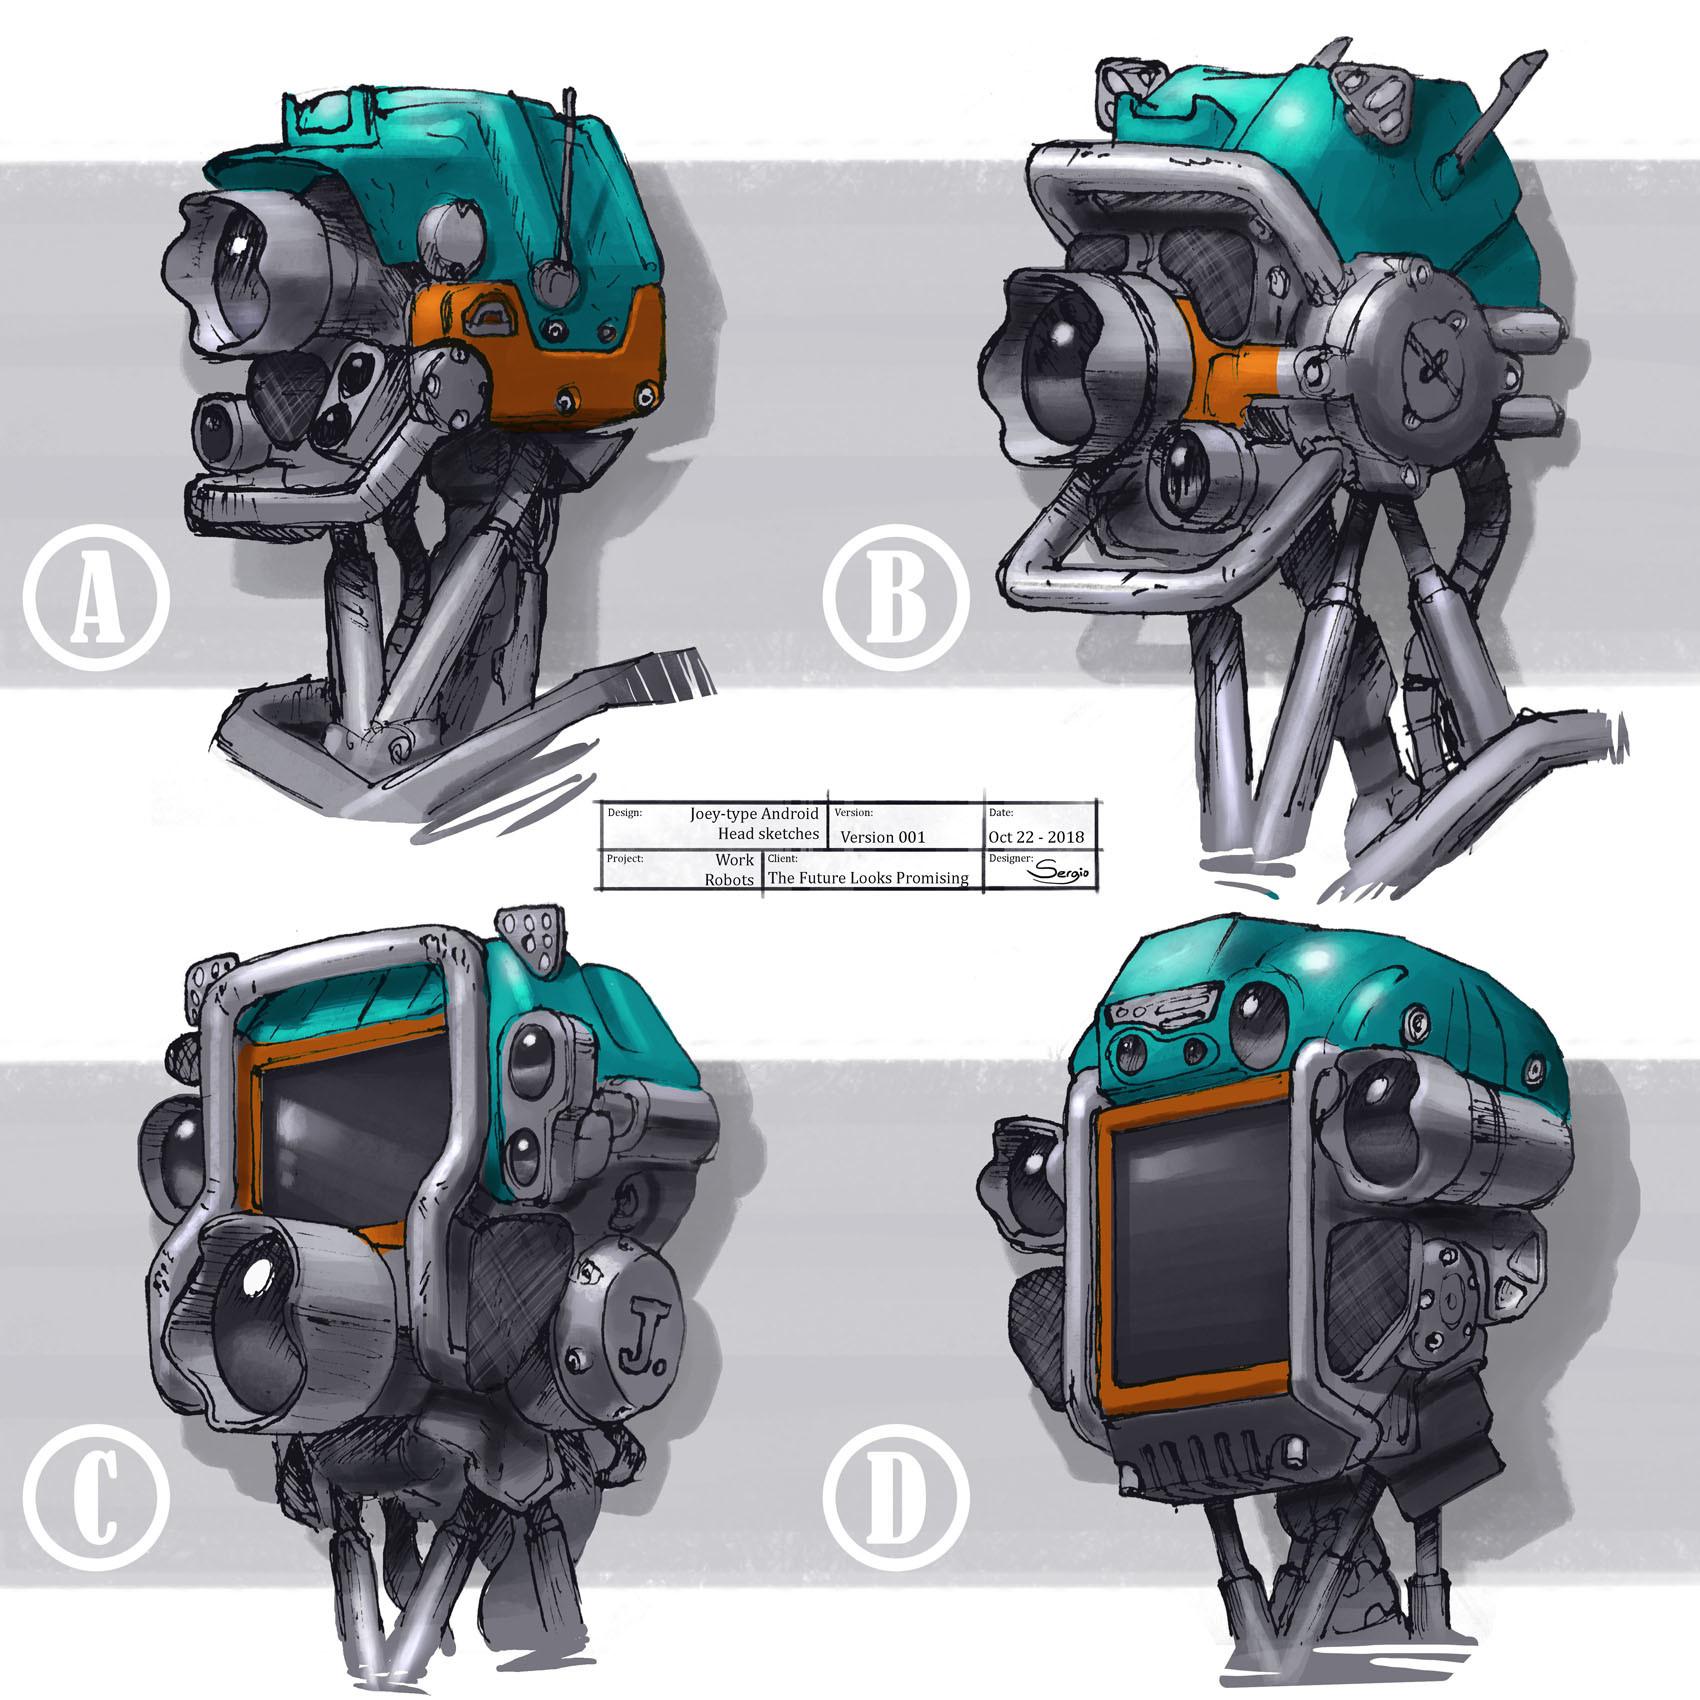 Sergio botero tflp masonbot hex sketches